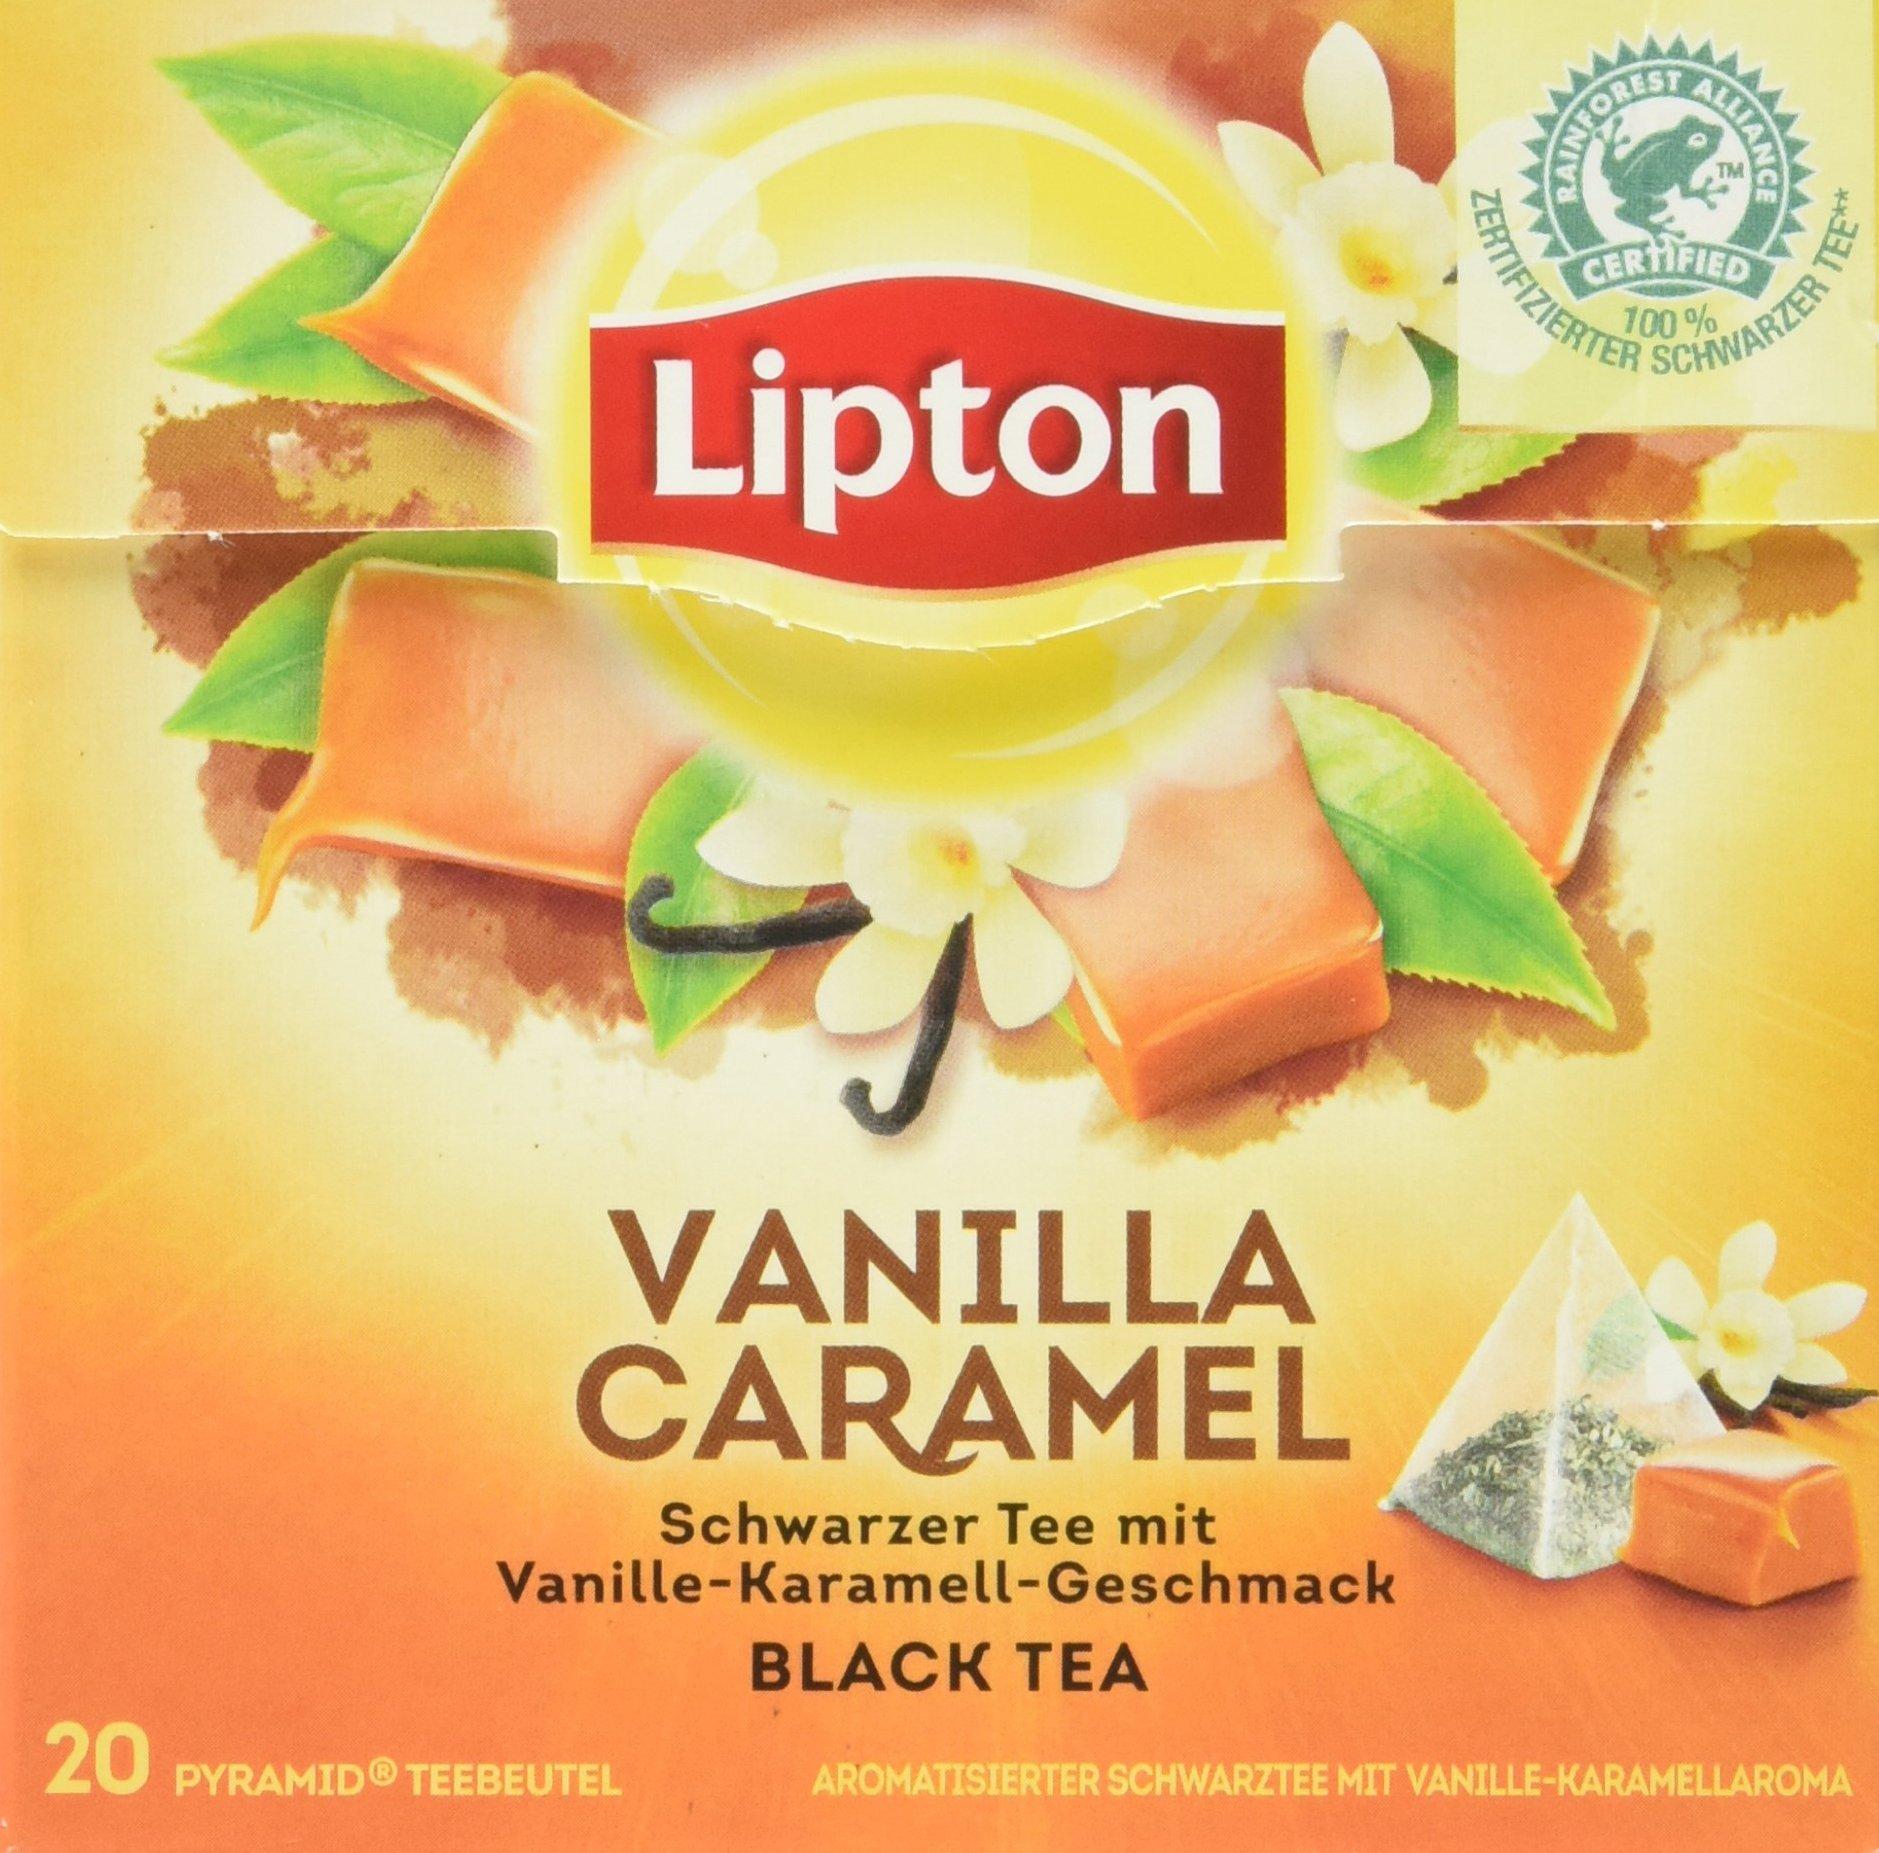 Lipton-Schwarzer-Tee-Vanille-Karamell-Pyramidenbeutel-20-Stck